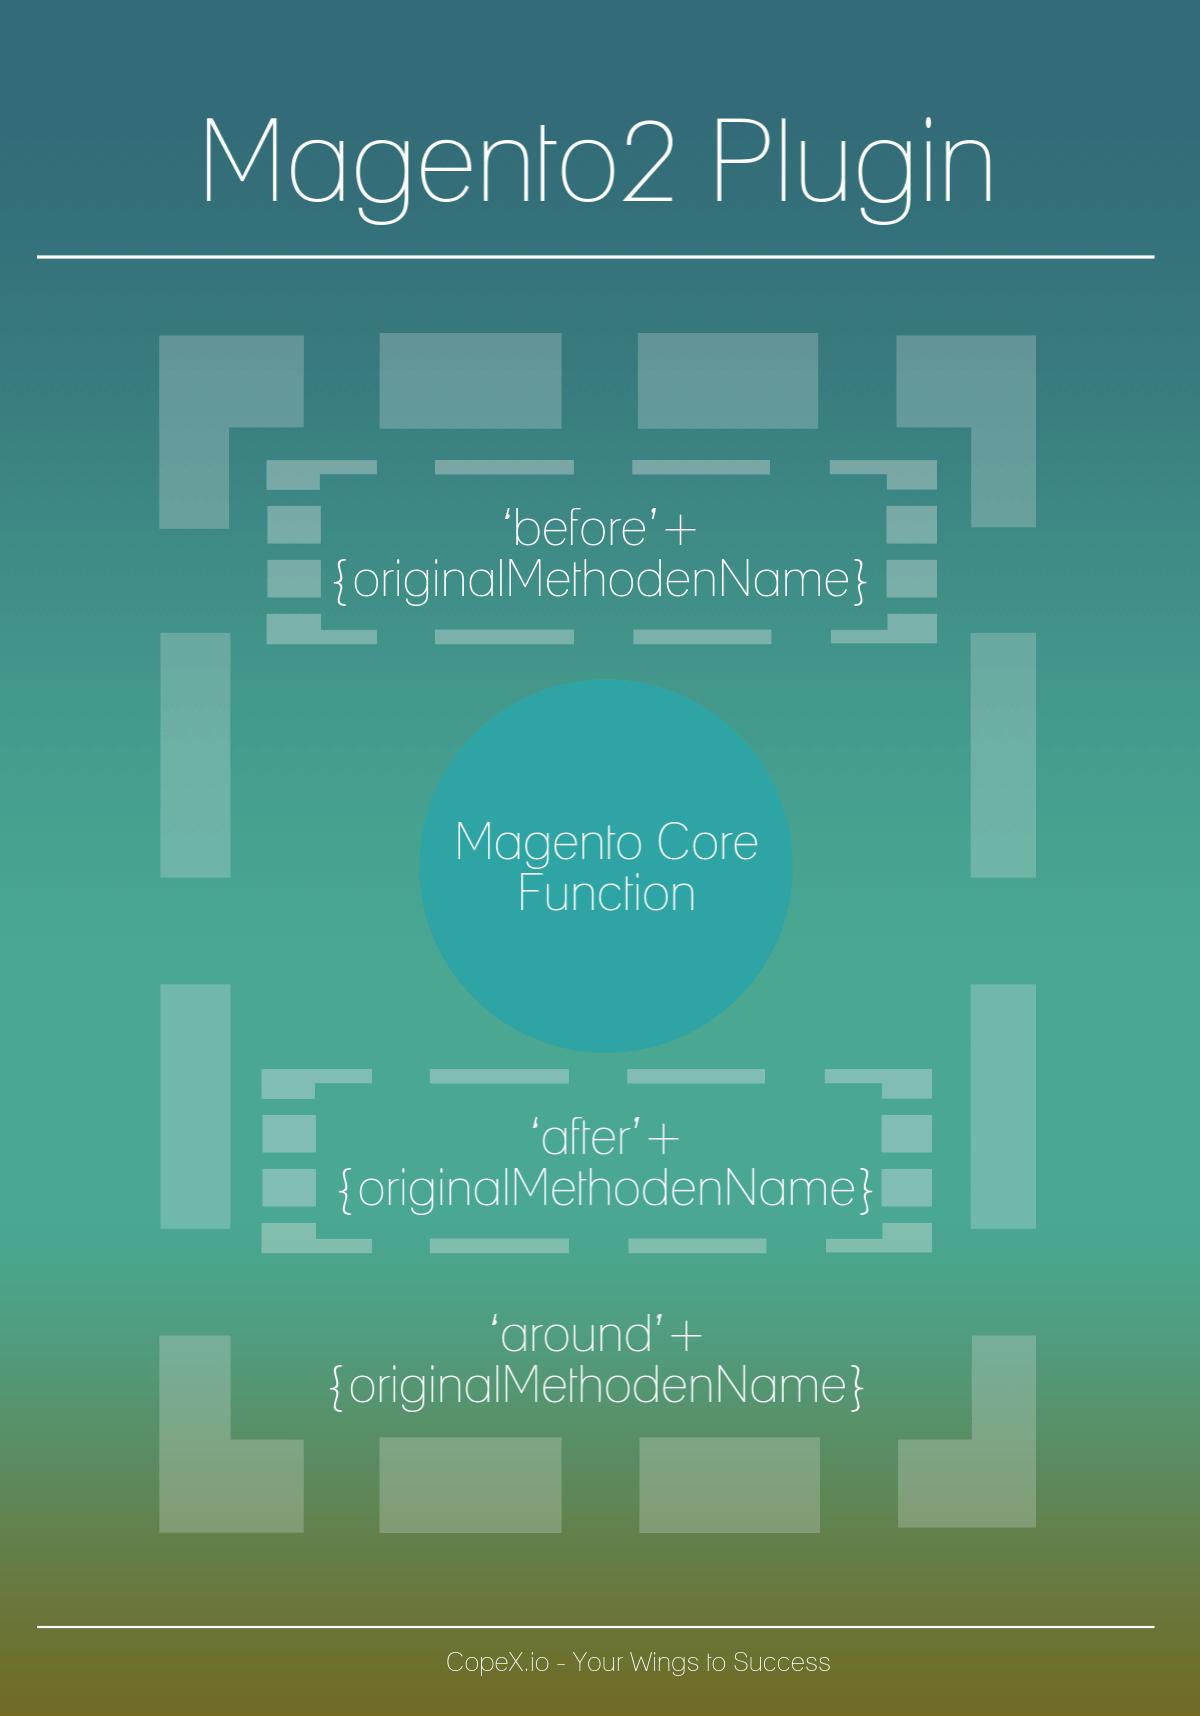 Magento2 Plugin